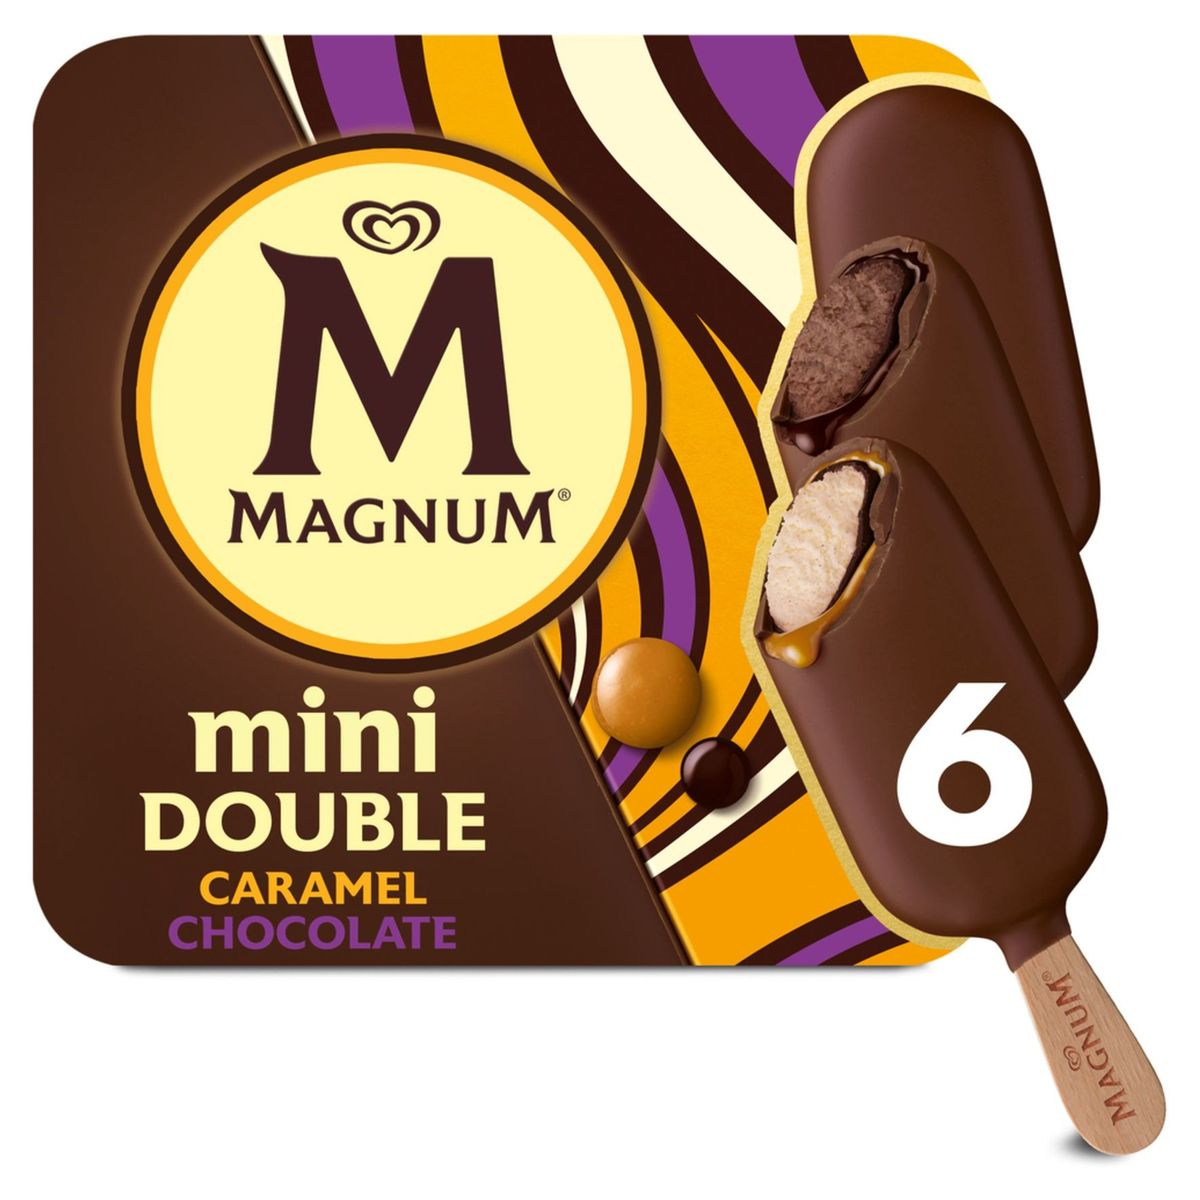 Magnum Ola Ijs Multipack Mini Double Caramel 6 x 60 ml